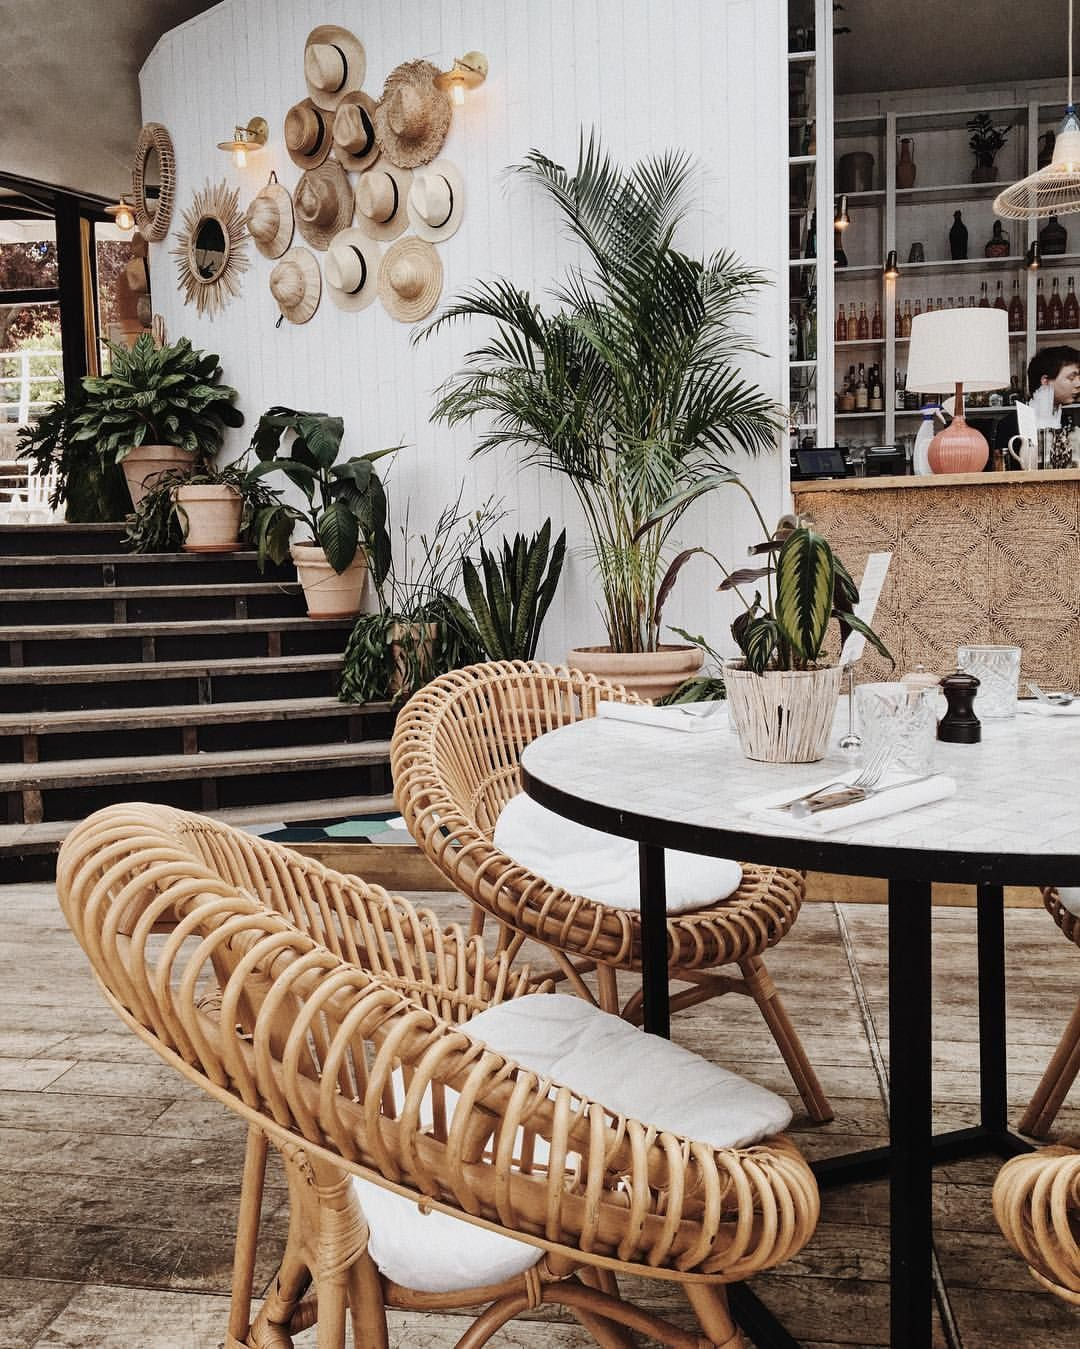 Polpo (sea food restaurant) | Restaurant Design | Pinterest ...